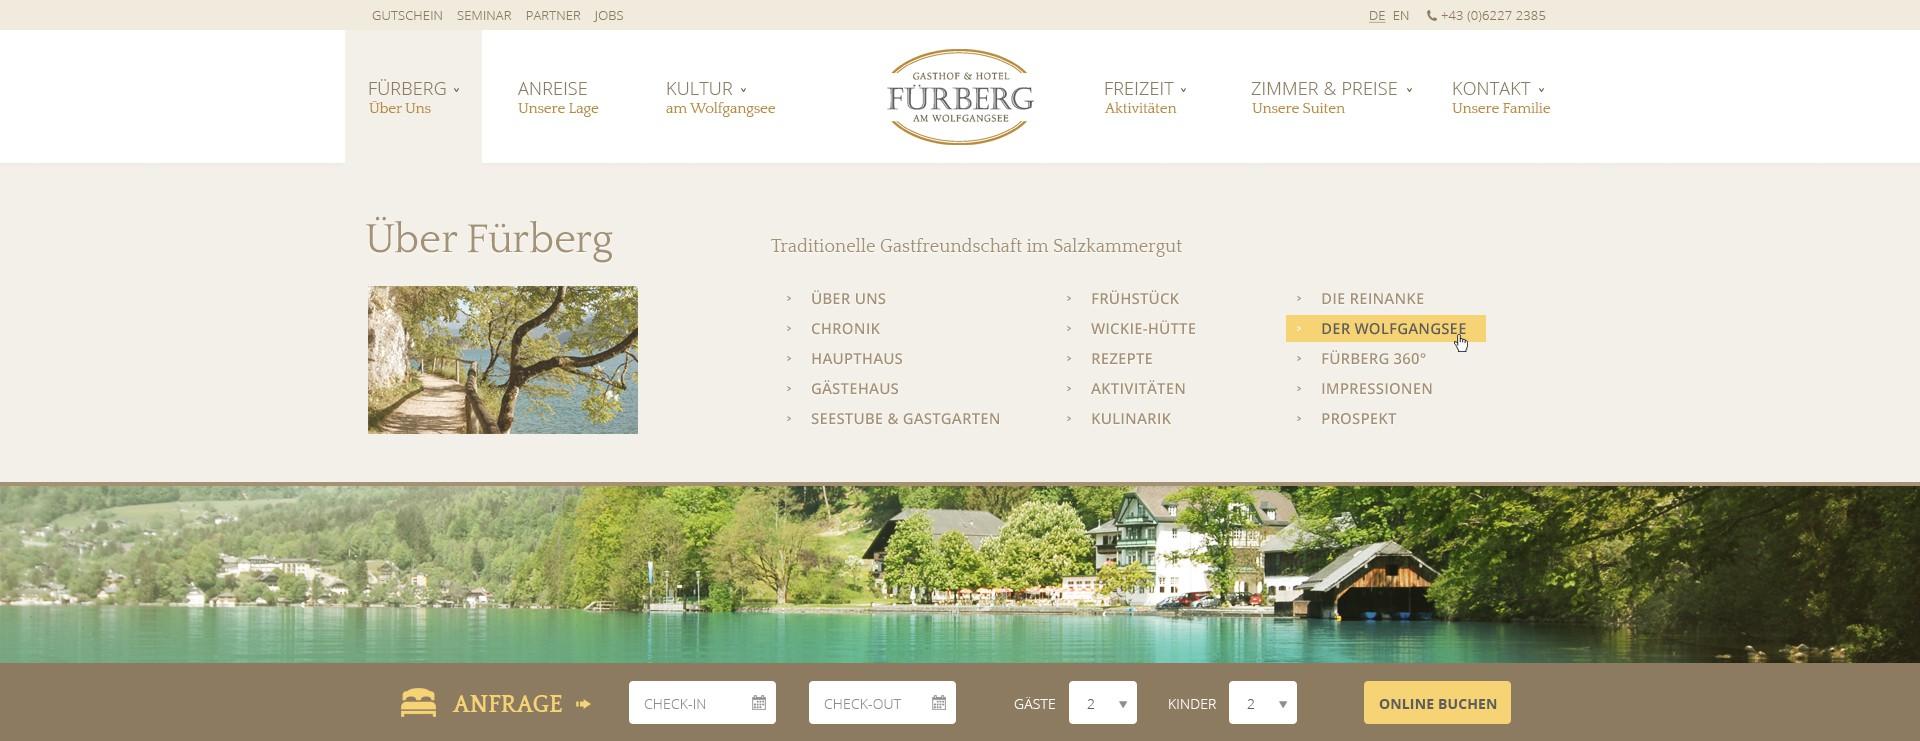 Fürberg Web redesign